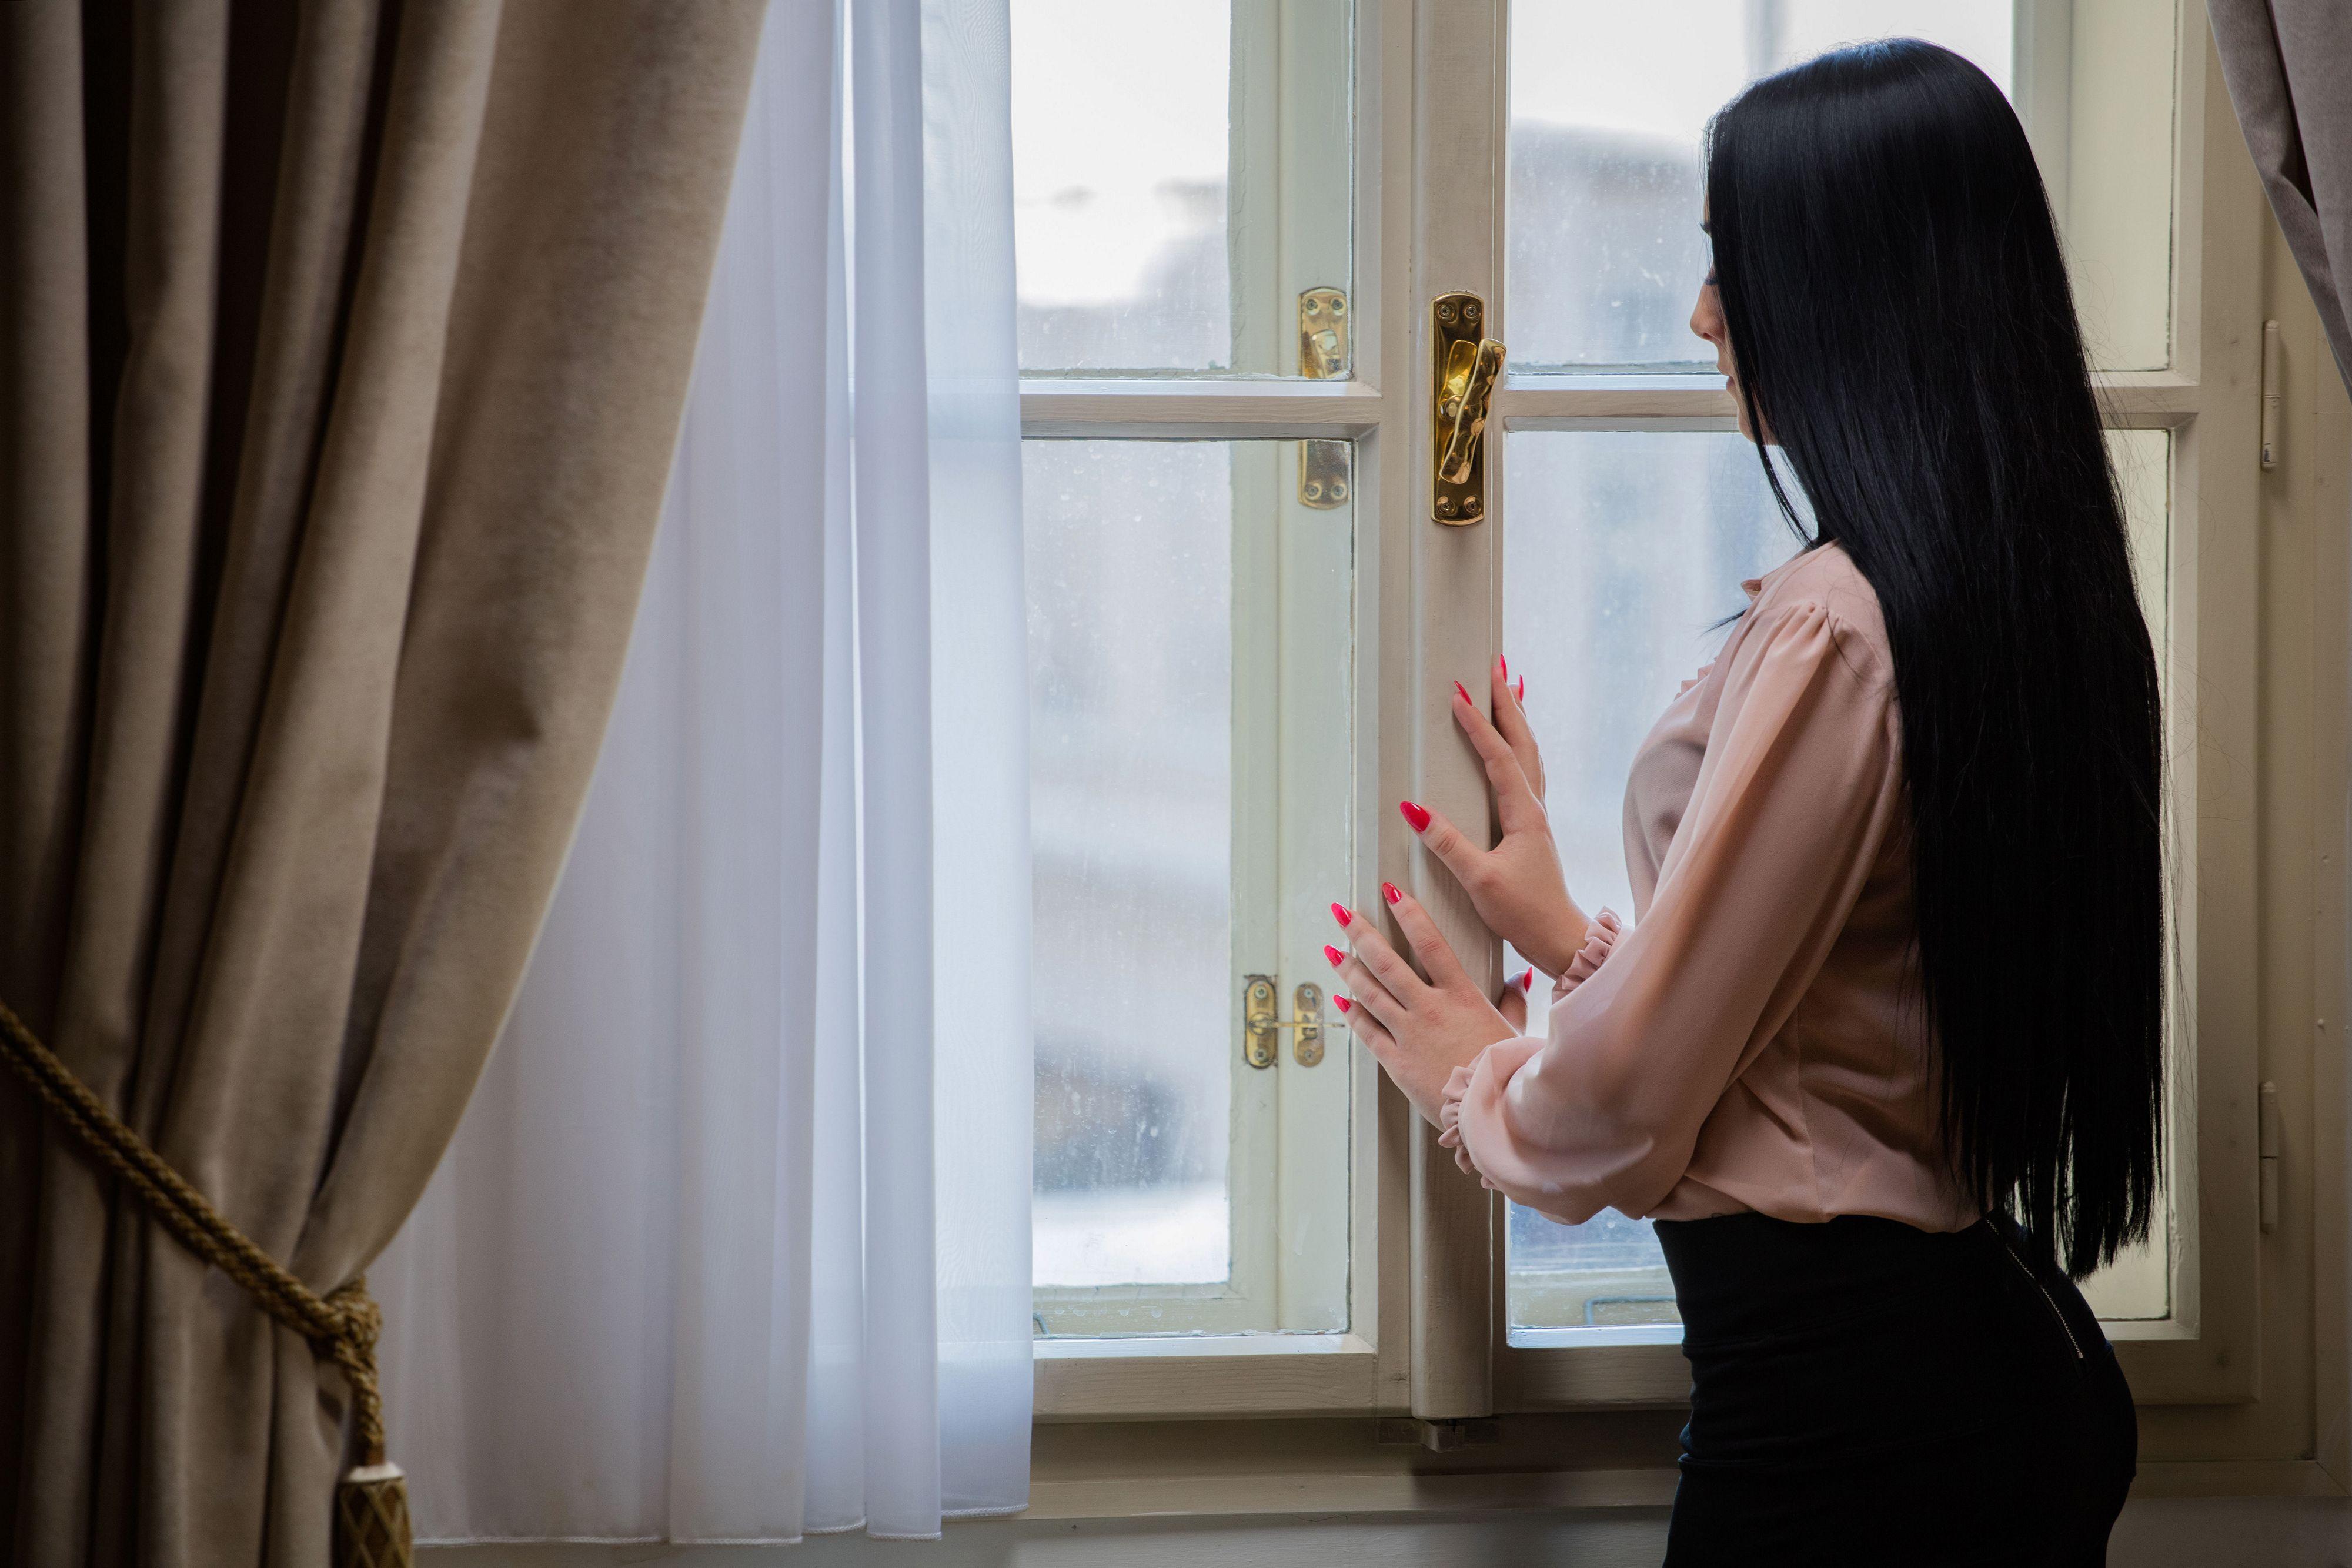 картинки девушка возле окна брюнетка эти устройства